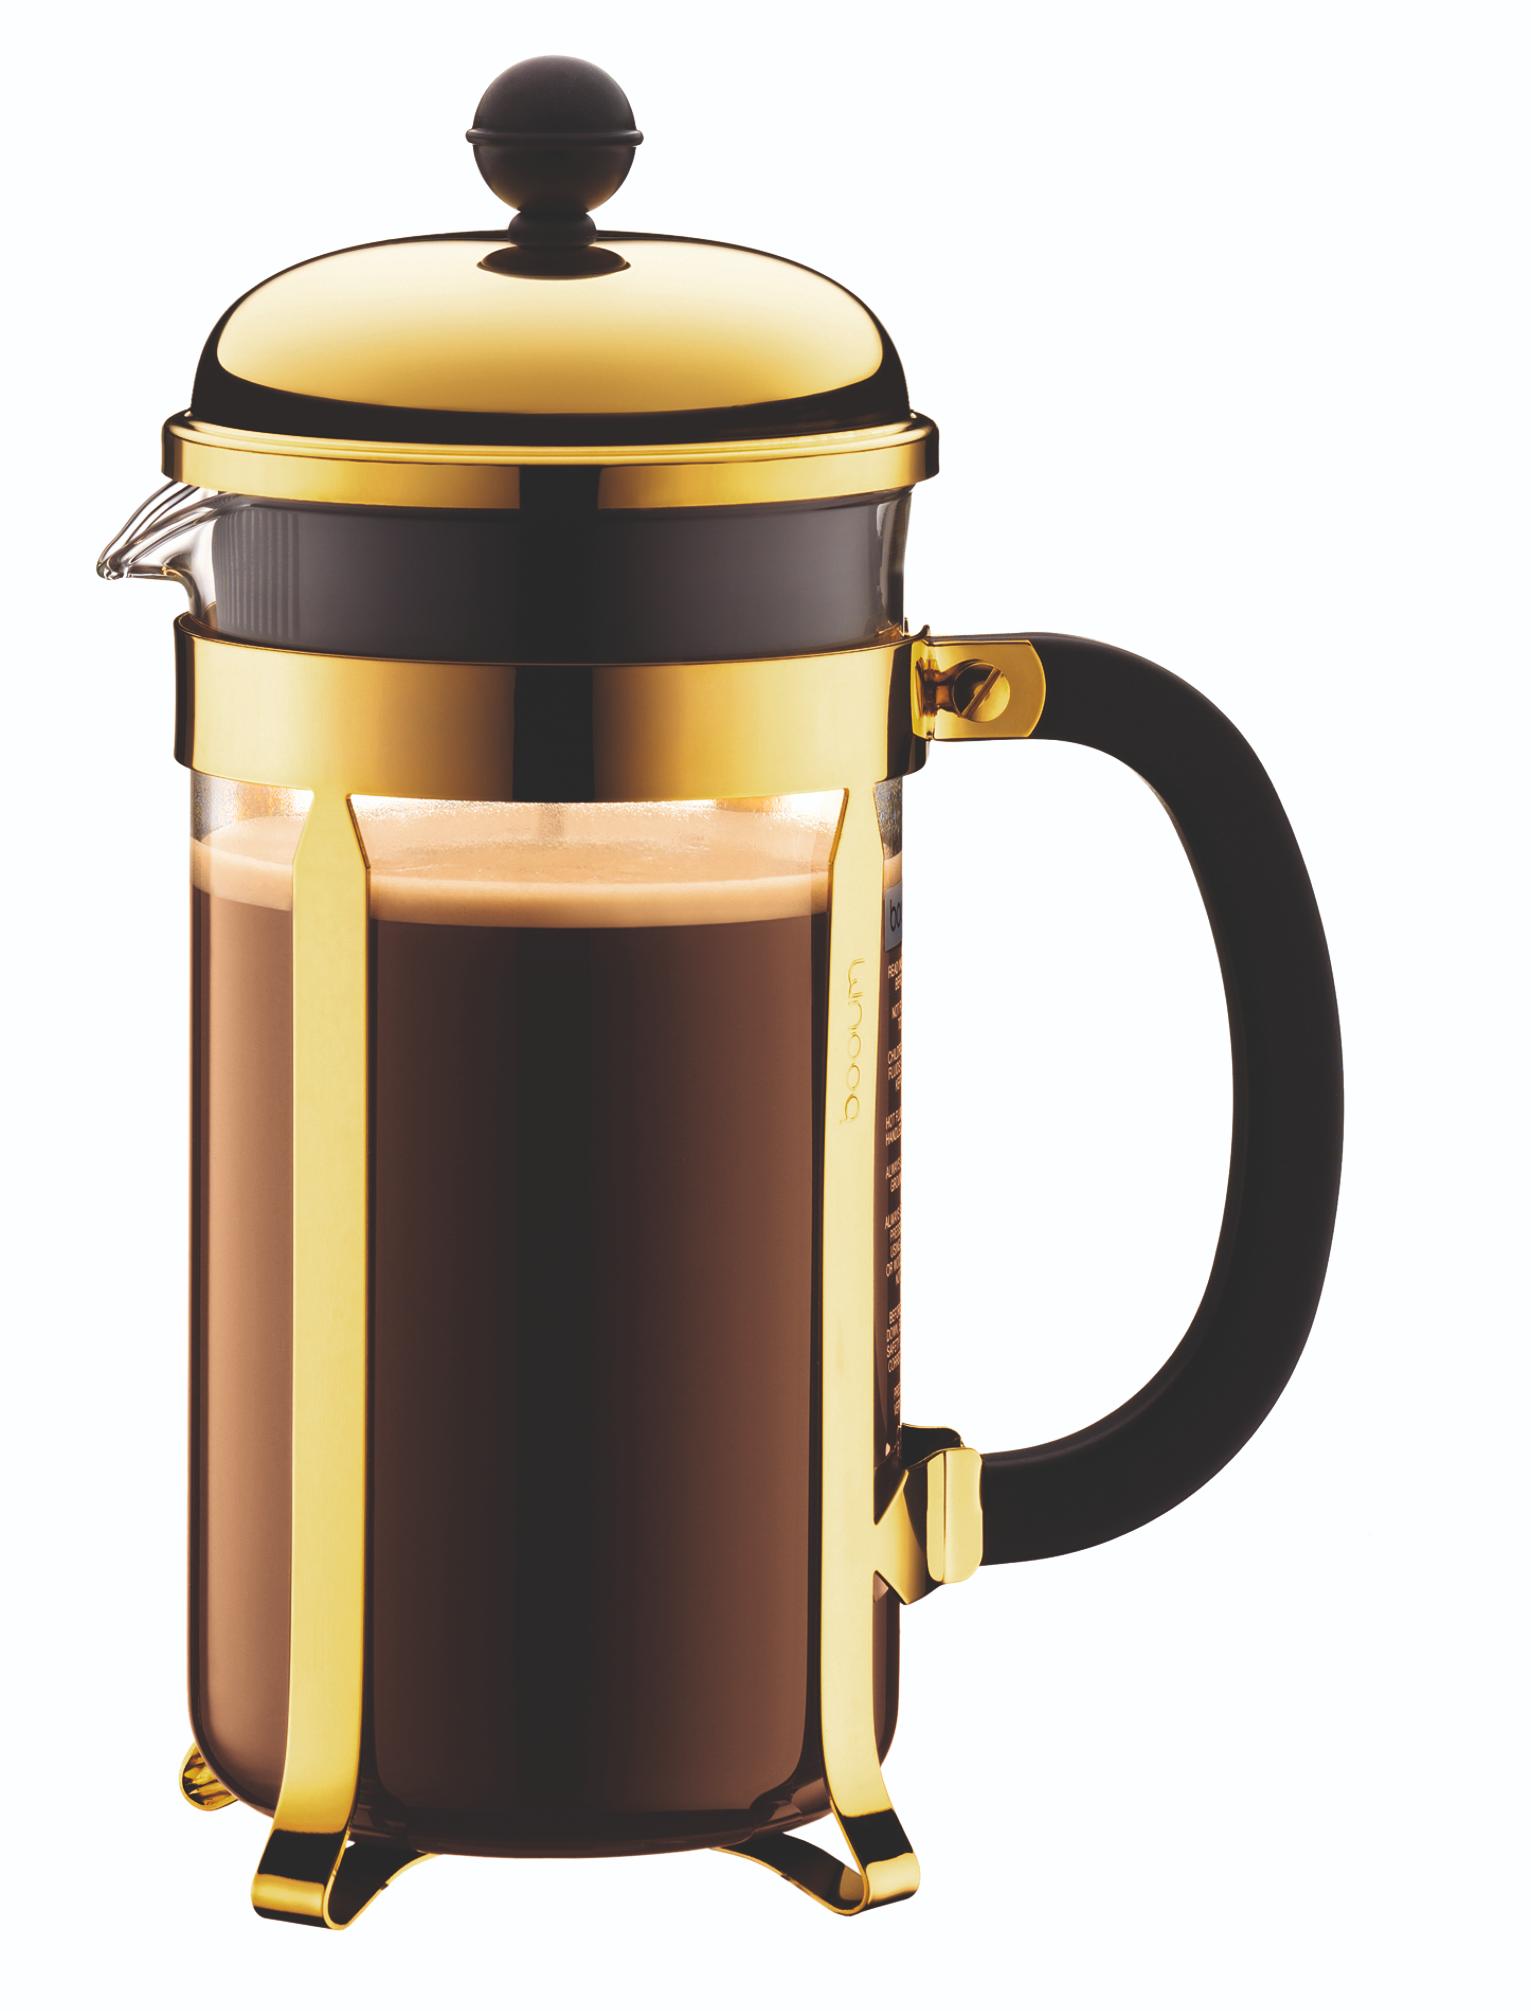 Bodum Cafeti?re Chambord Goud 1.5 Liter